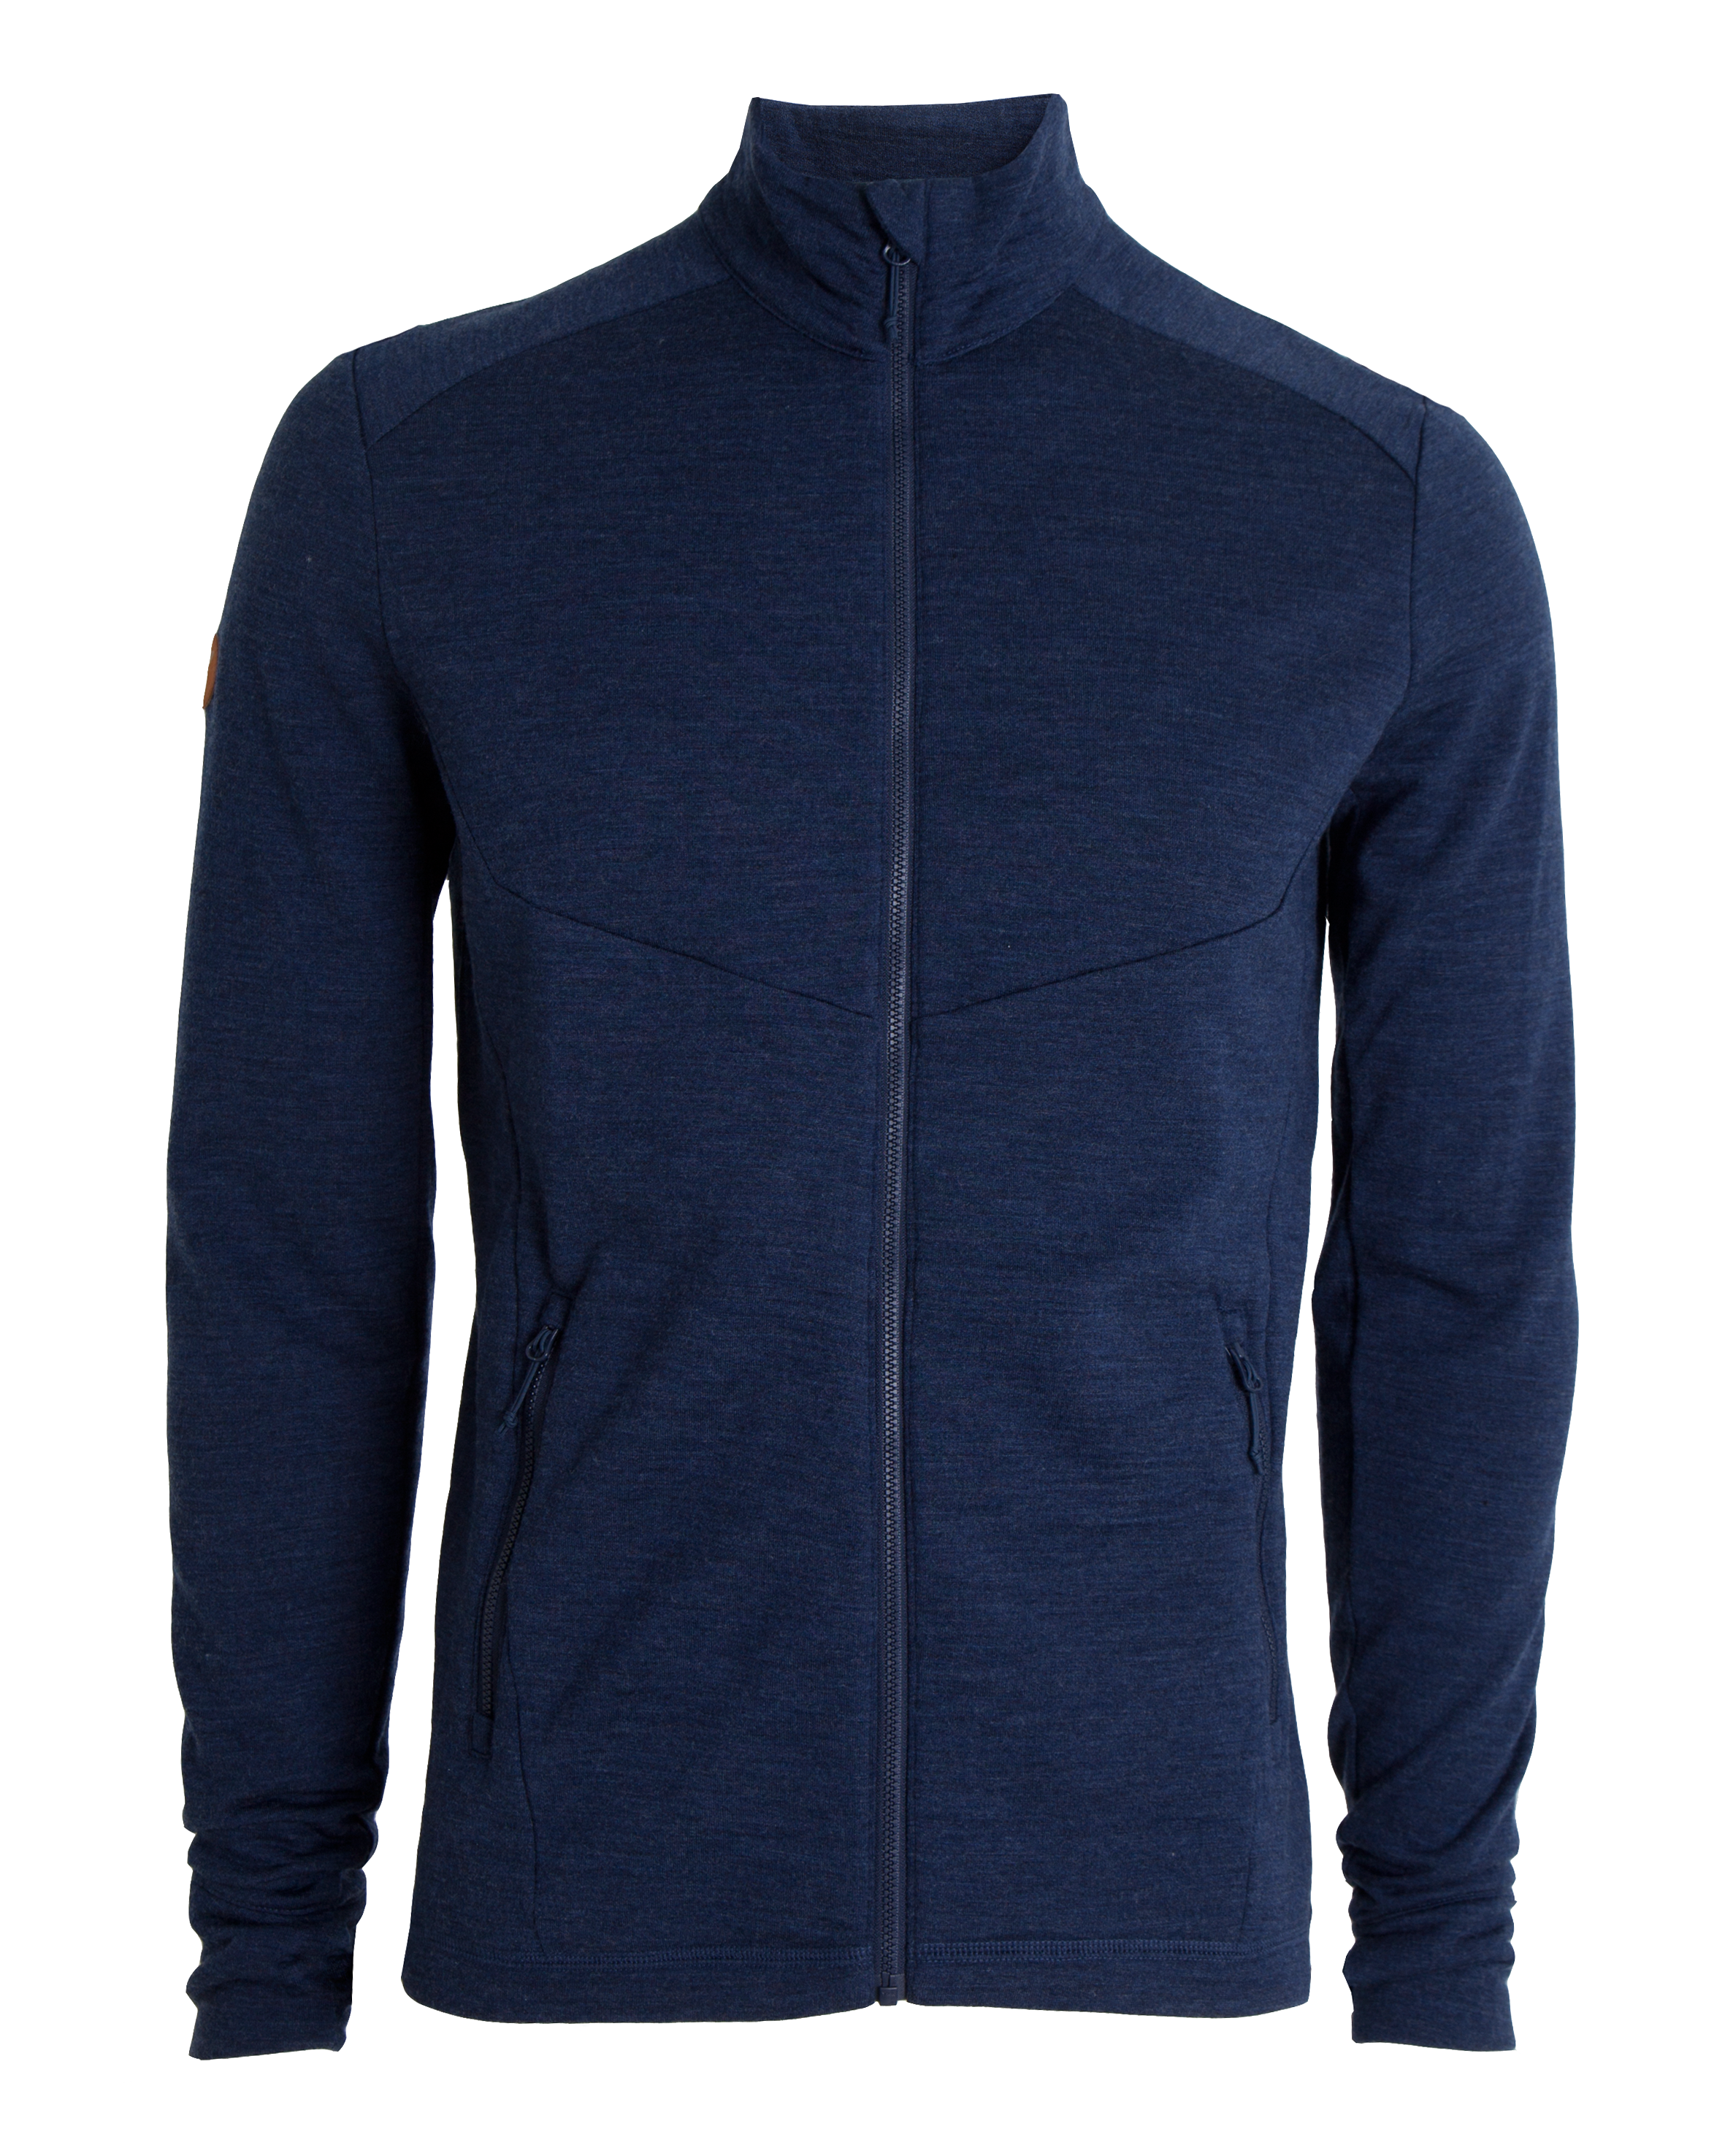 AW18 Tufte Wool Fleece Jacket Men Dress Blues Melange Front.png